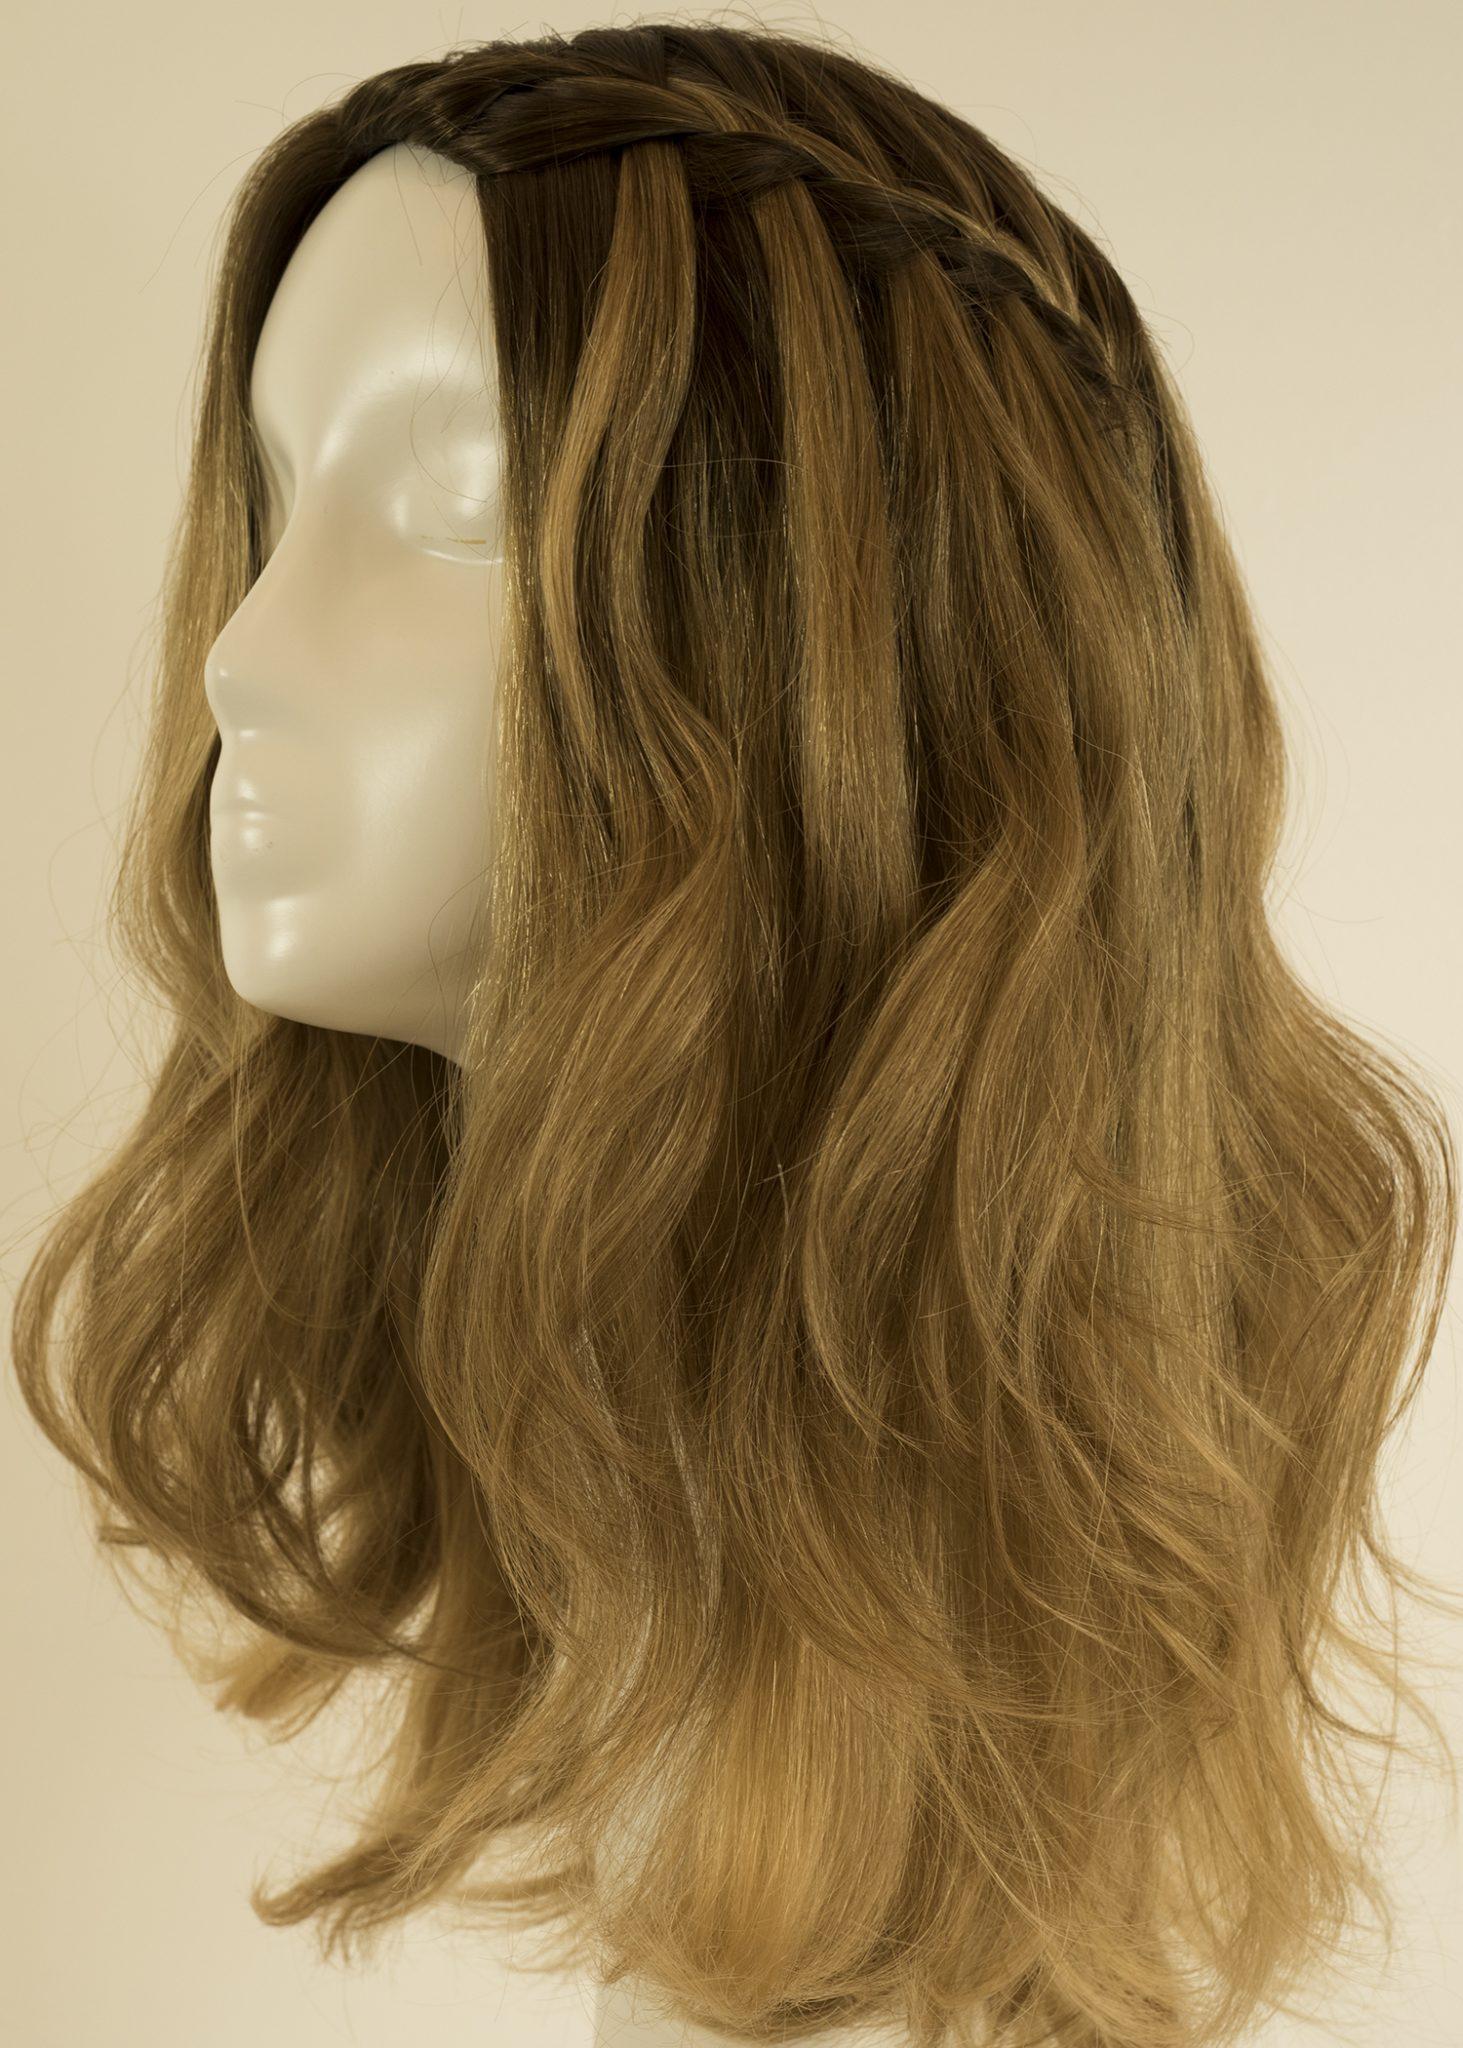 european hair. wig, sheitel, hombre. multi wig system, wig, sheitel, euopean remy processed hair